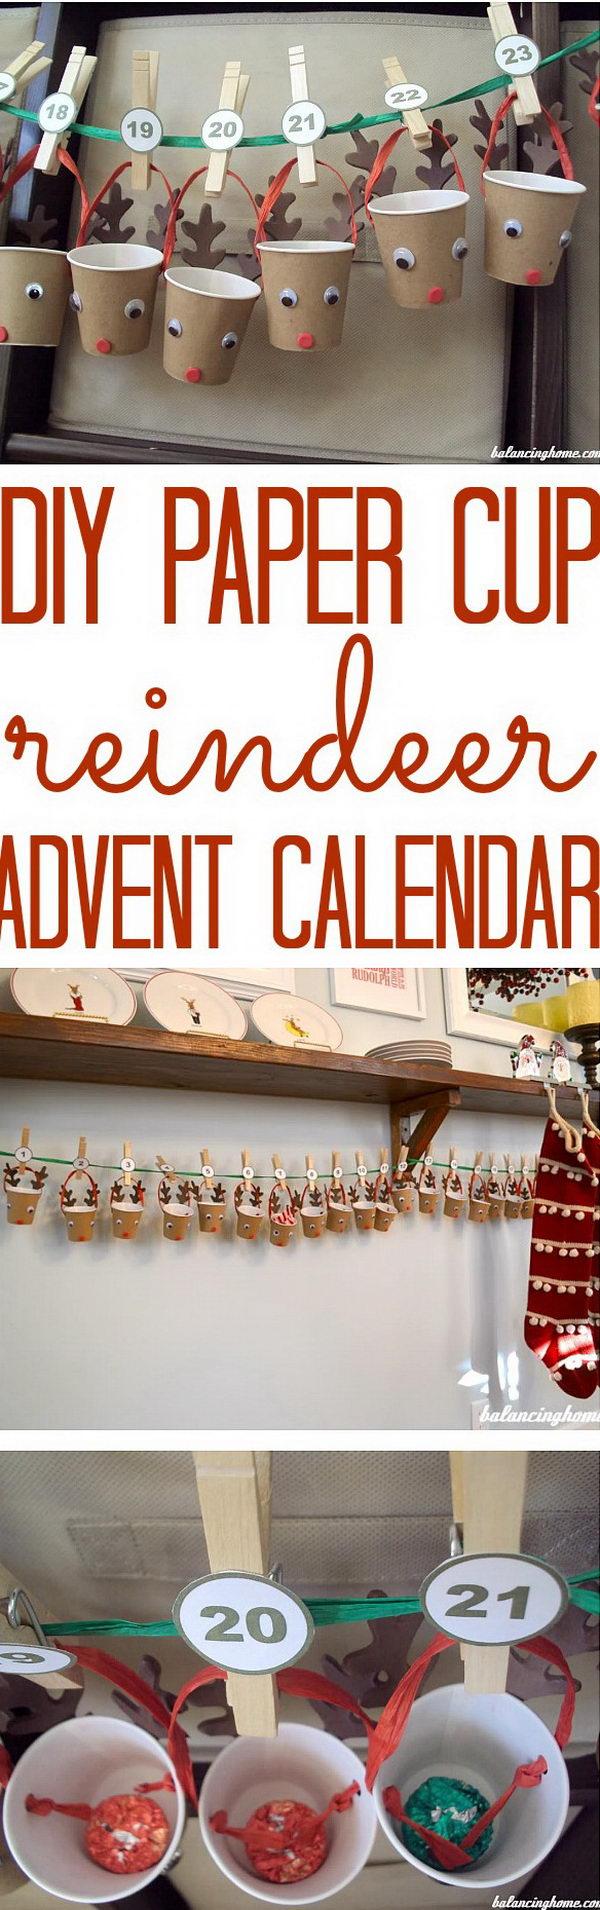 DIY Paper Cup Reindeer Advent Calendar.